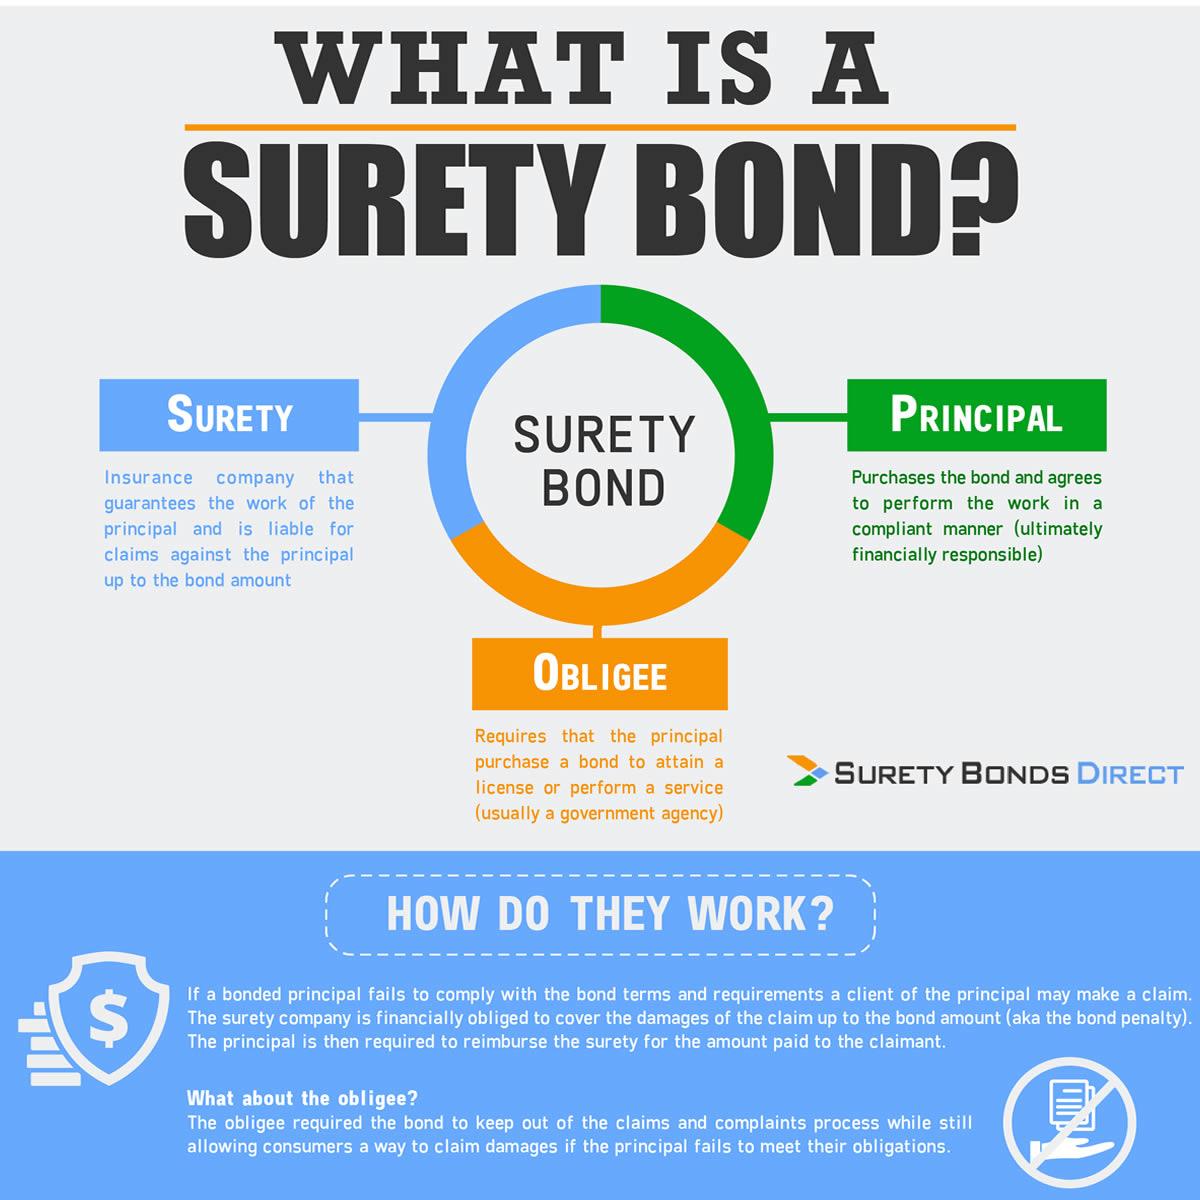 Surety bond | Surety bond provider - Kingrise Finance Limited